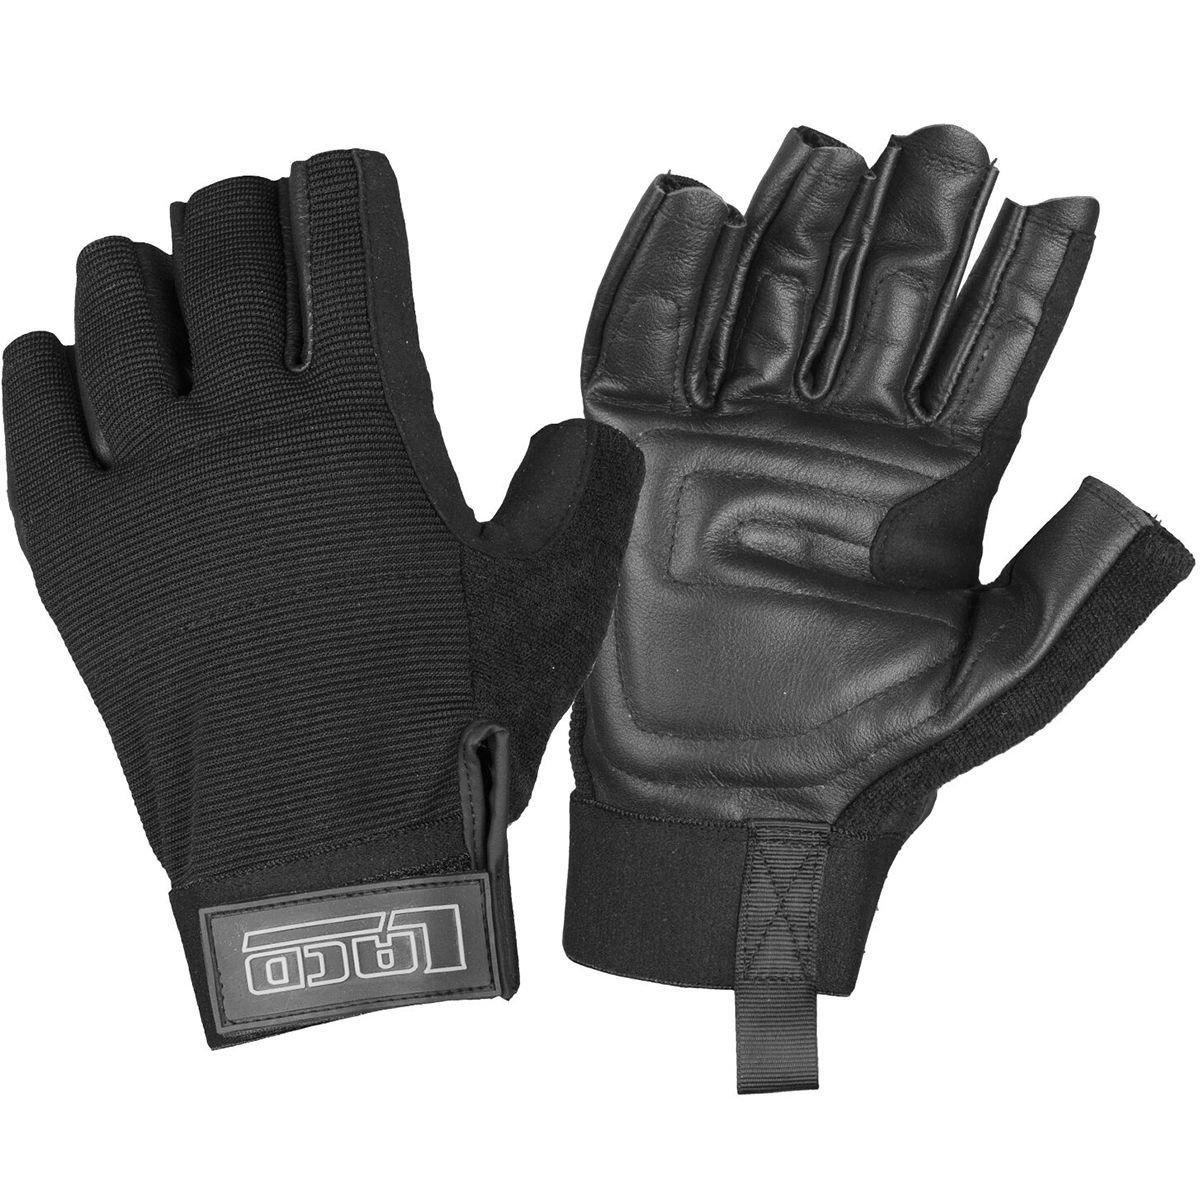 Handschuh Via Ferrata Glove Heavy Duty black LACD